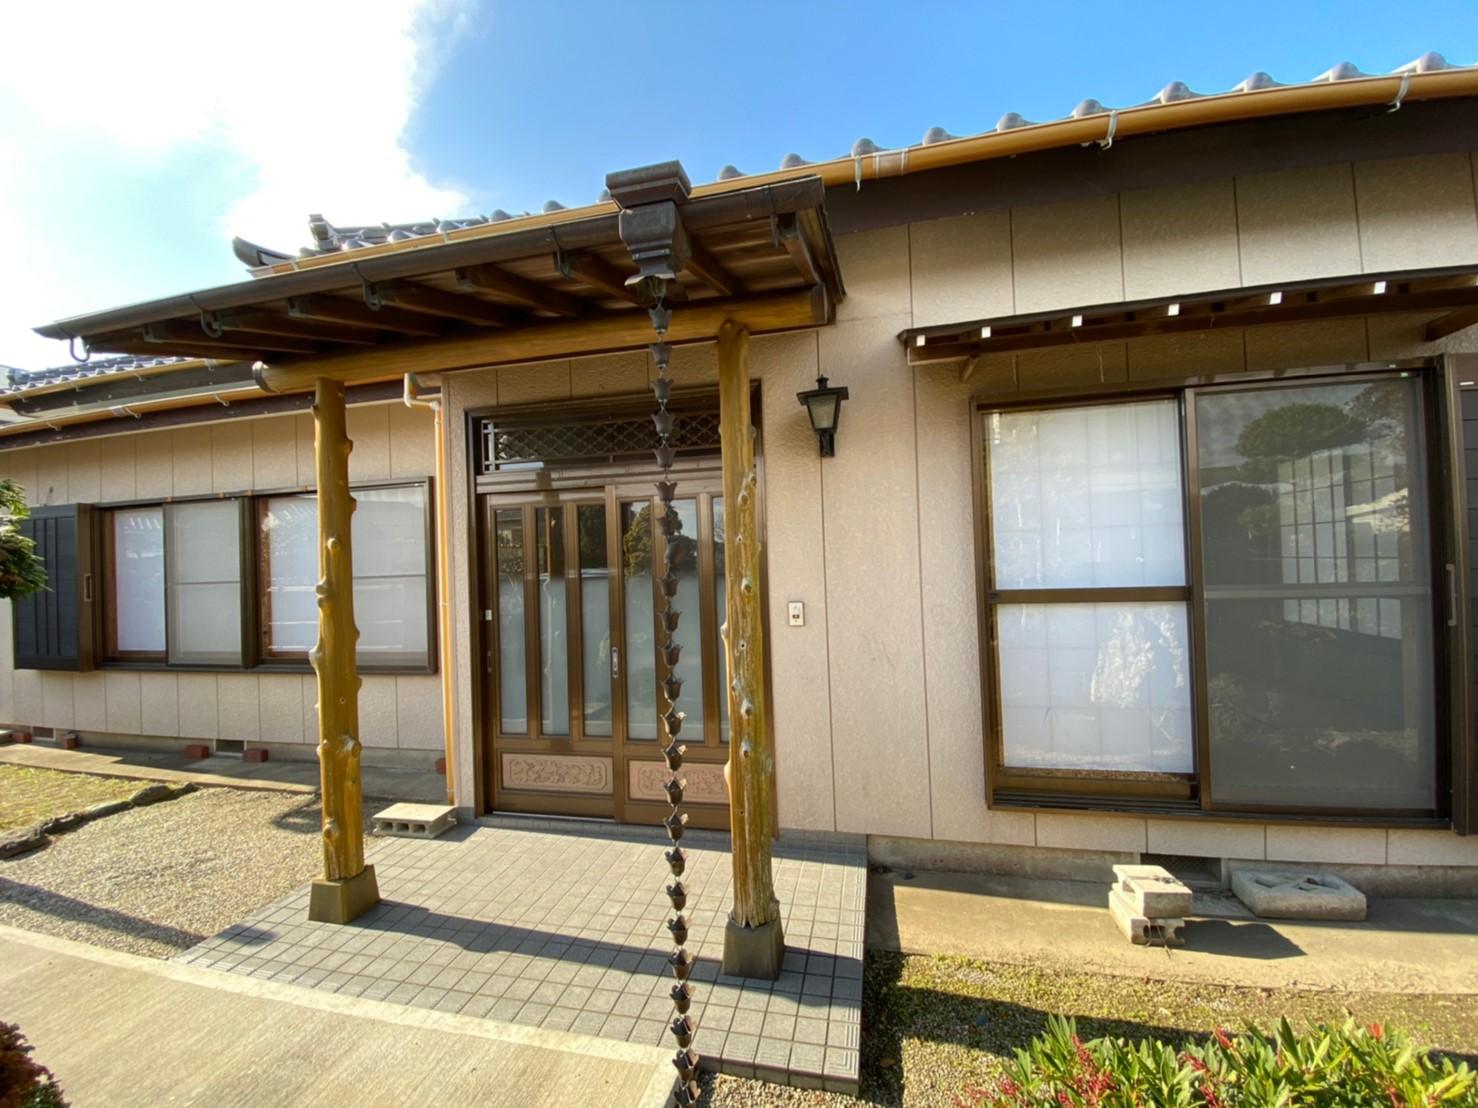 館山城下の贅沢な純和風平家住宅